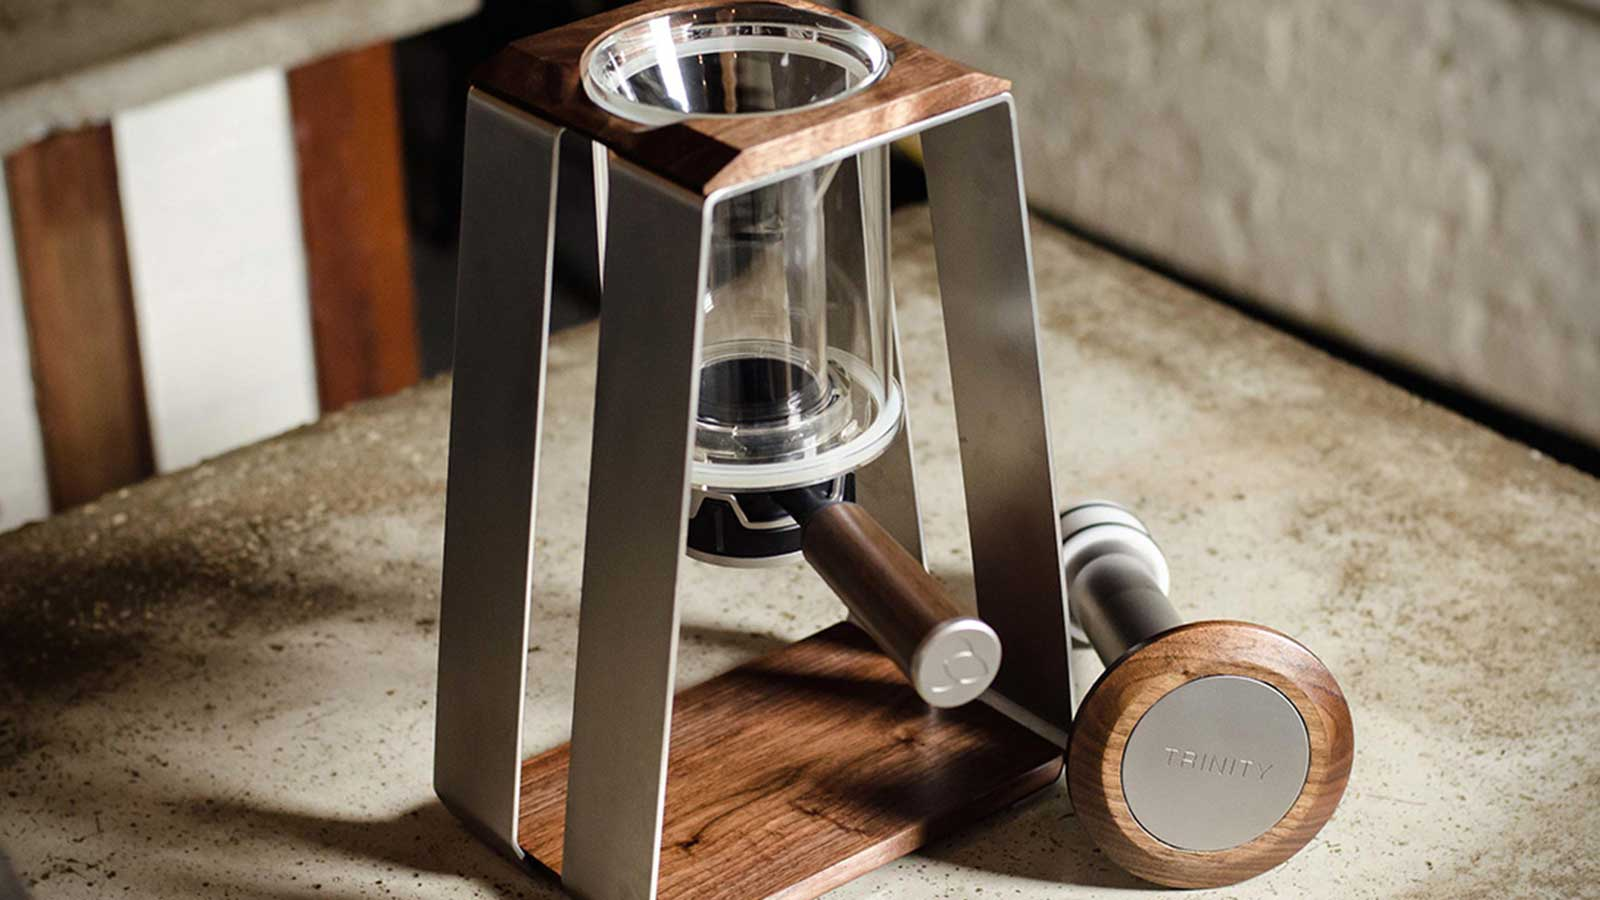 TRINITY ONE COFFEE BREWER